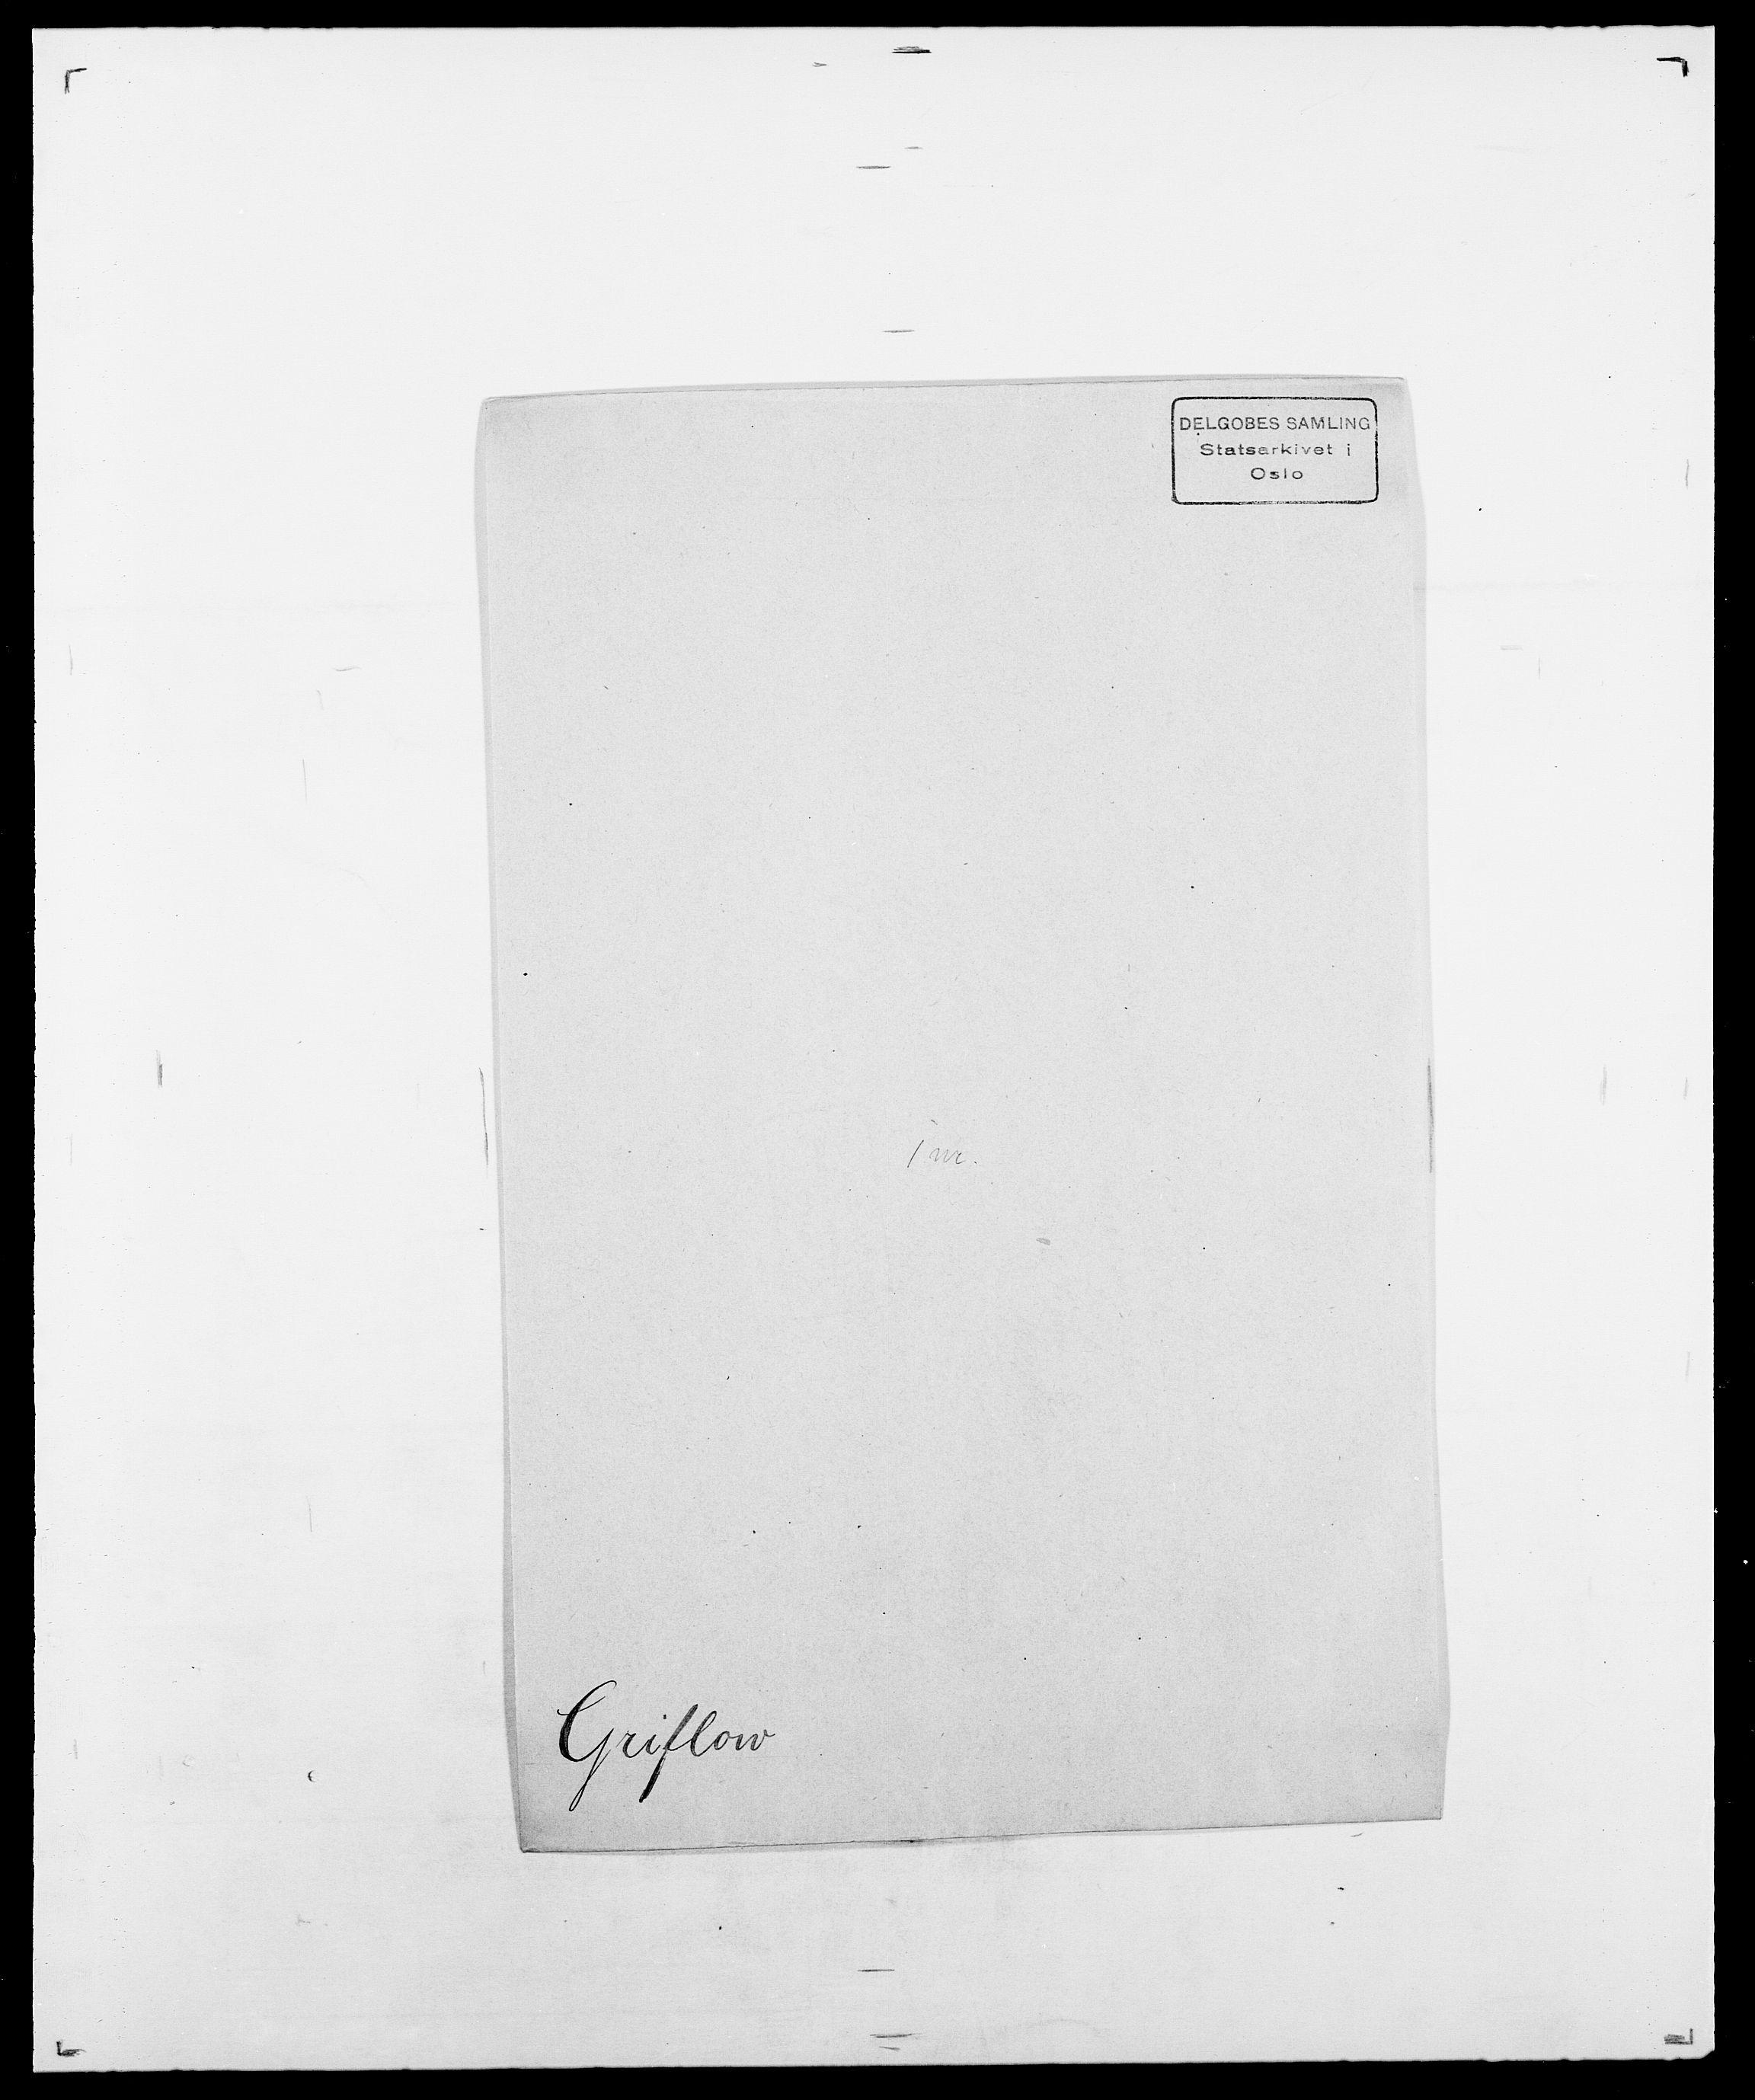 SAO, Delgobe, Charles Antoine - samling, D/Da/L0014: Giebdhausen - Grip, s. 649